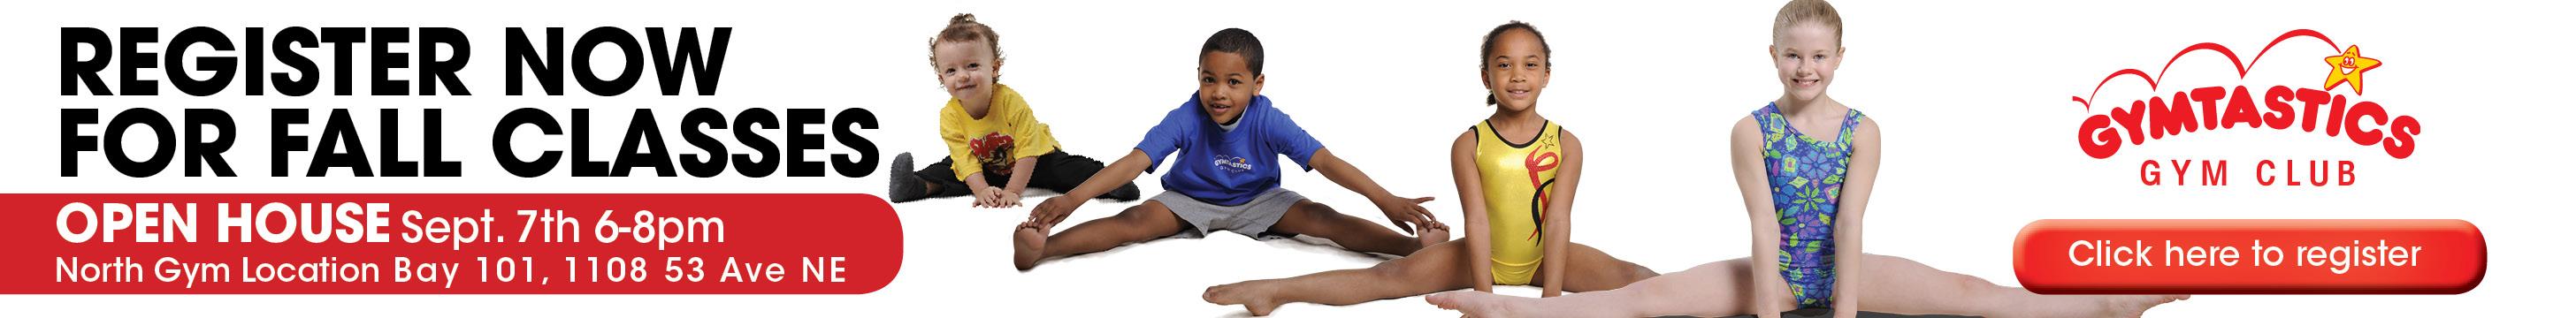 Gymnastics Aug 2016